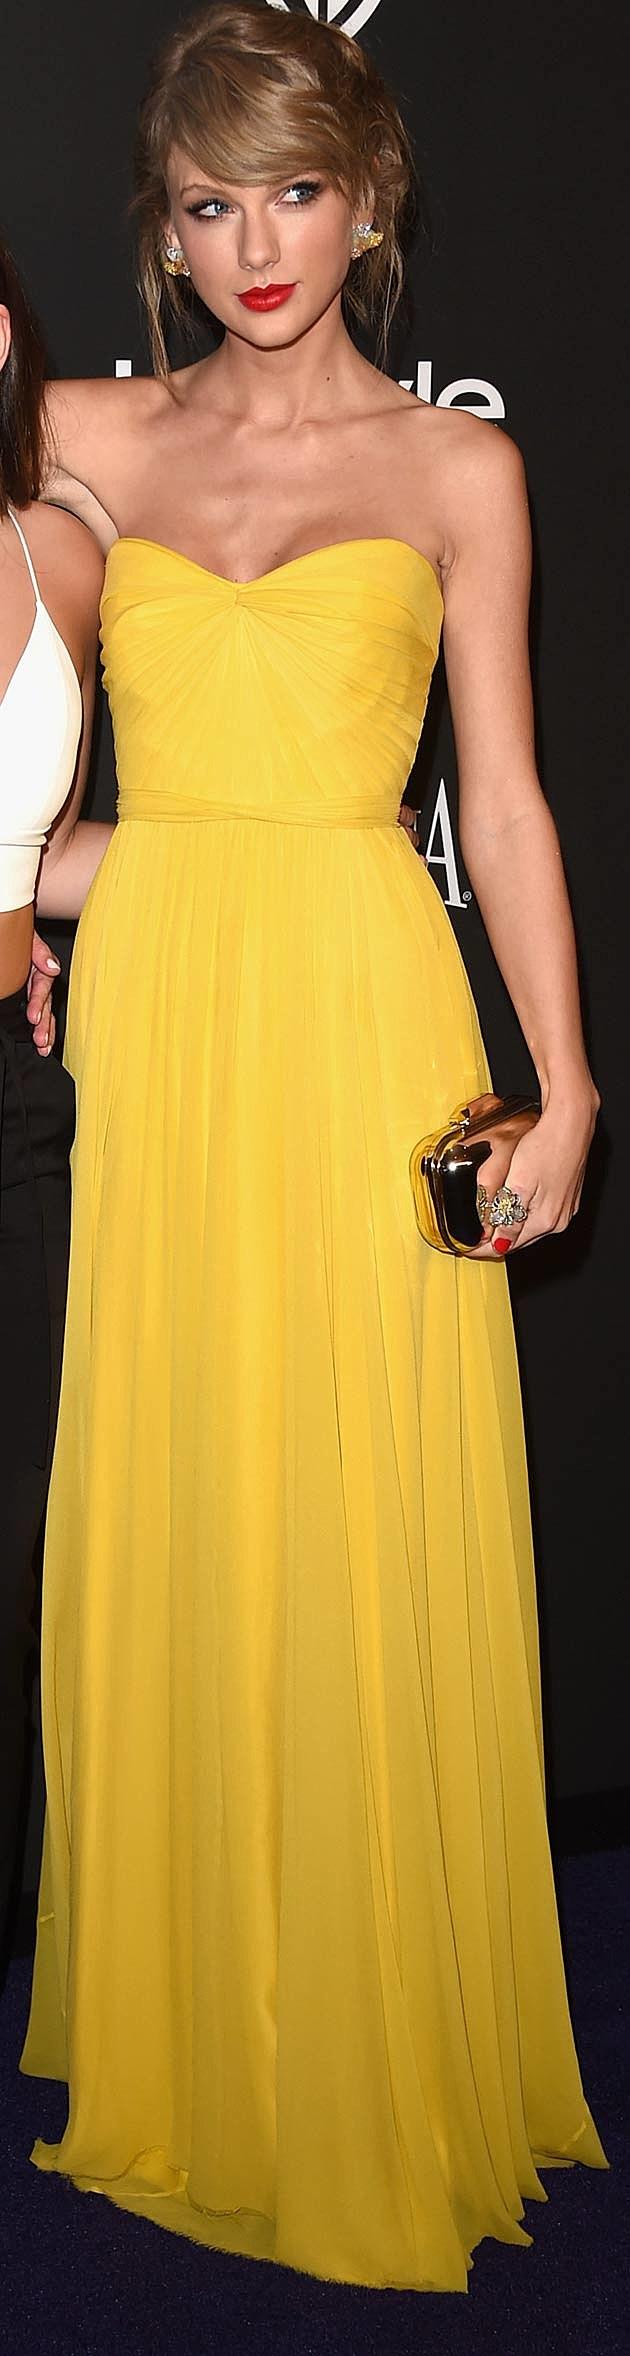 yellow dress at golden globes